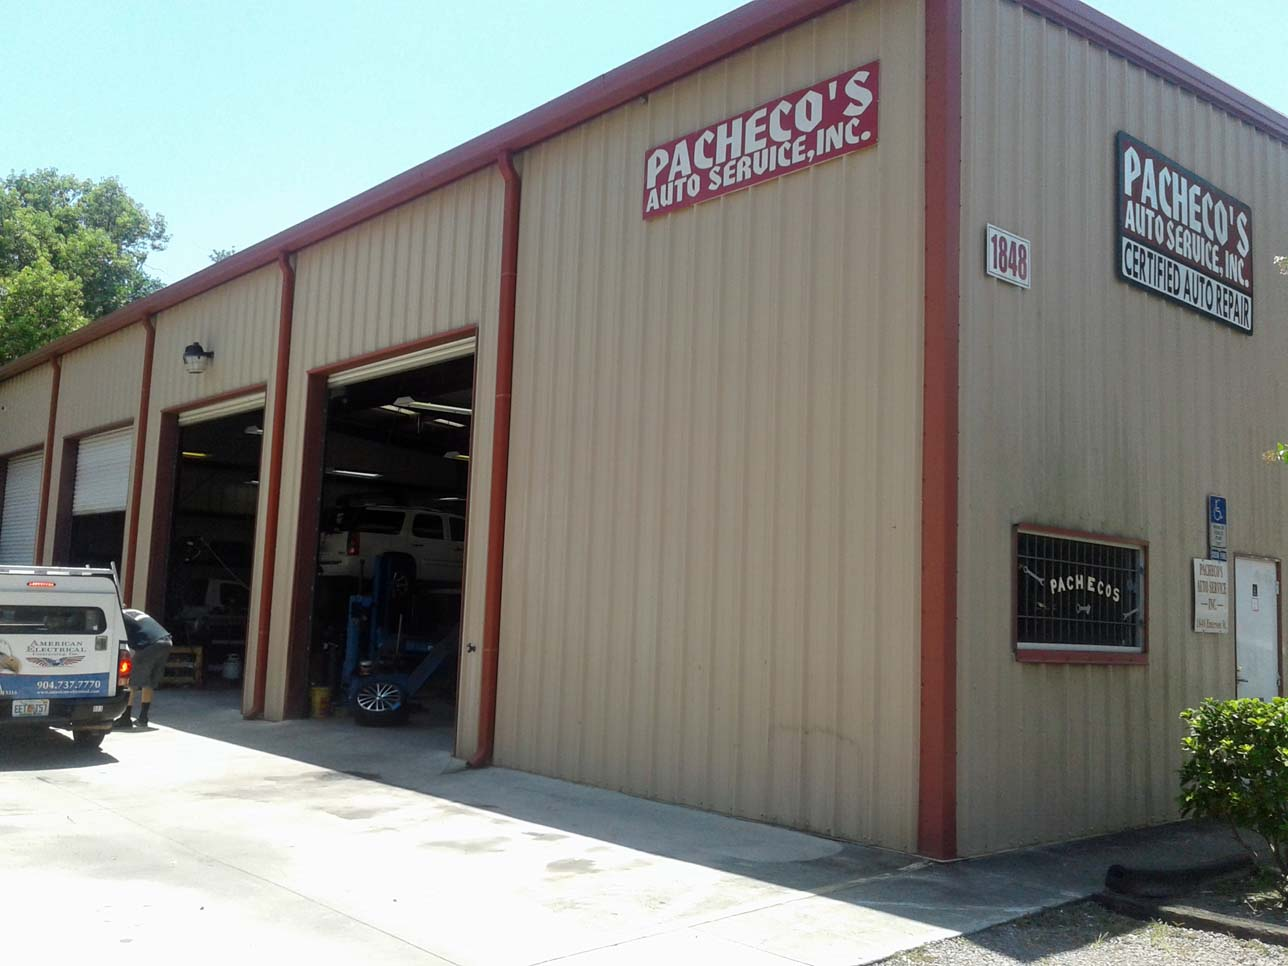 Pacheco Auto Services